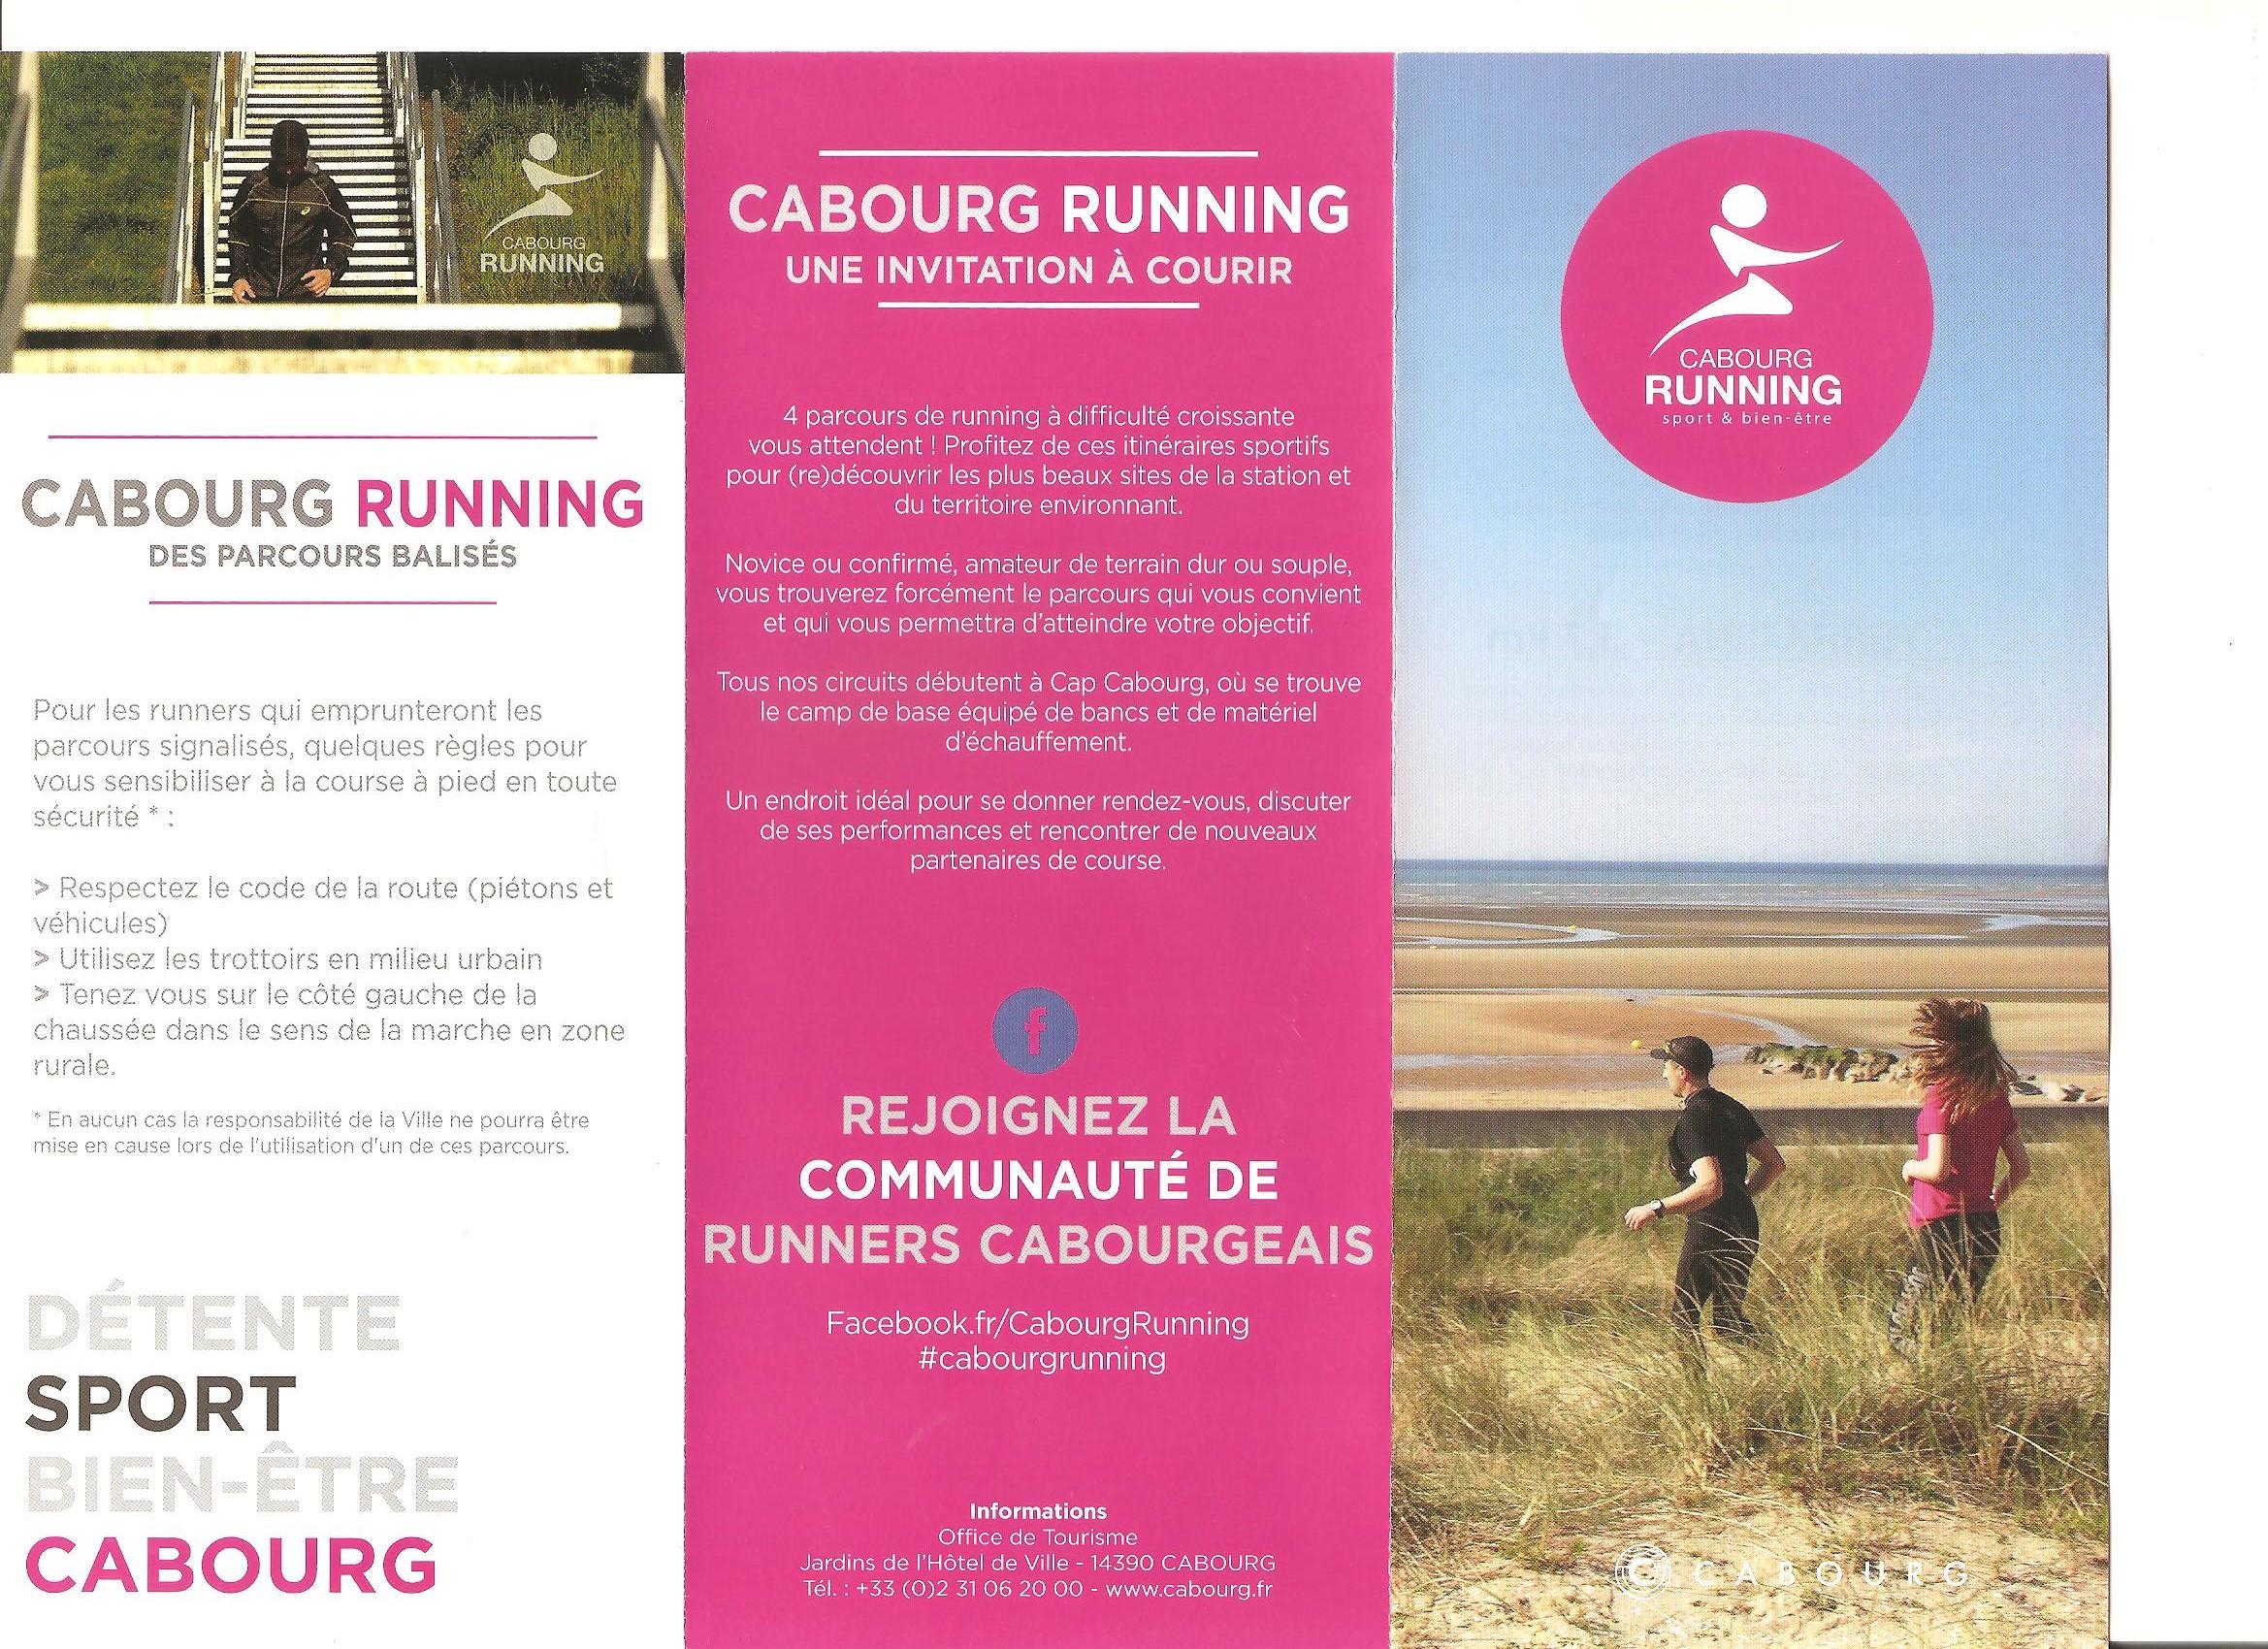 Cabourg, un amour de Runner